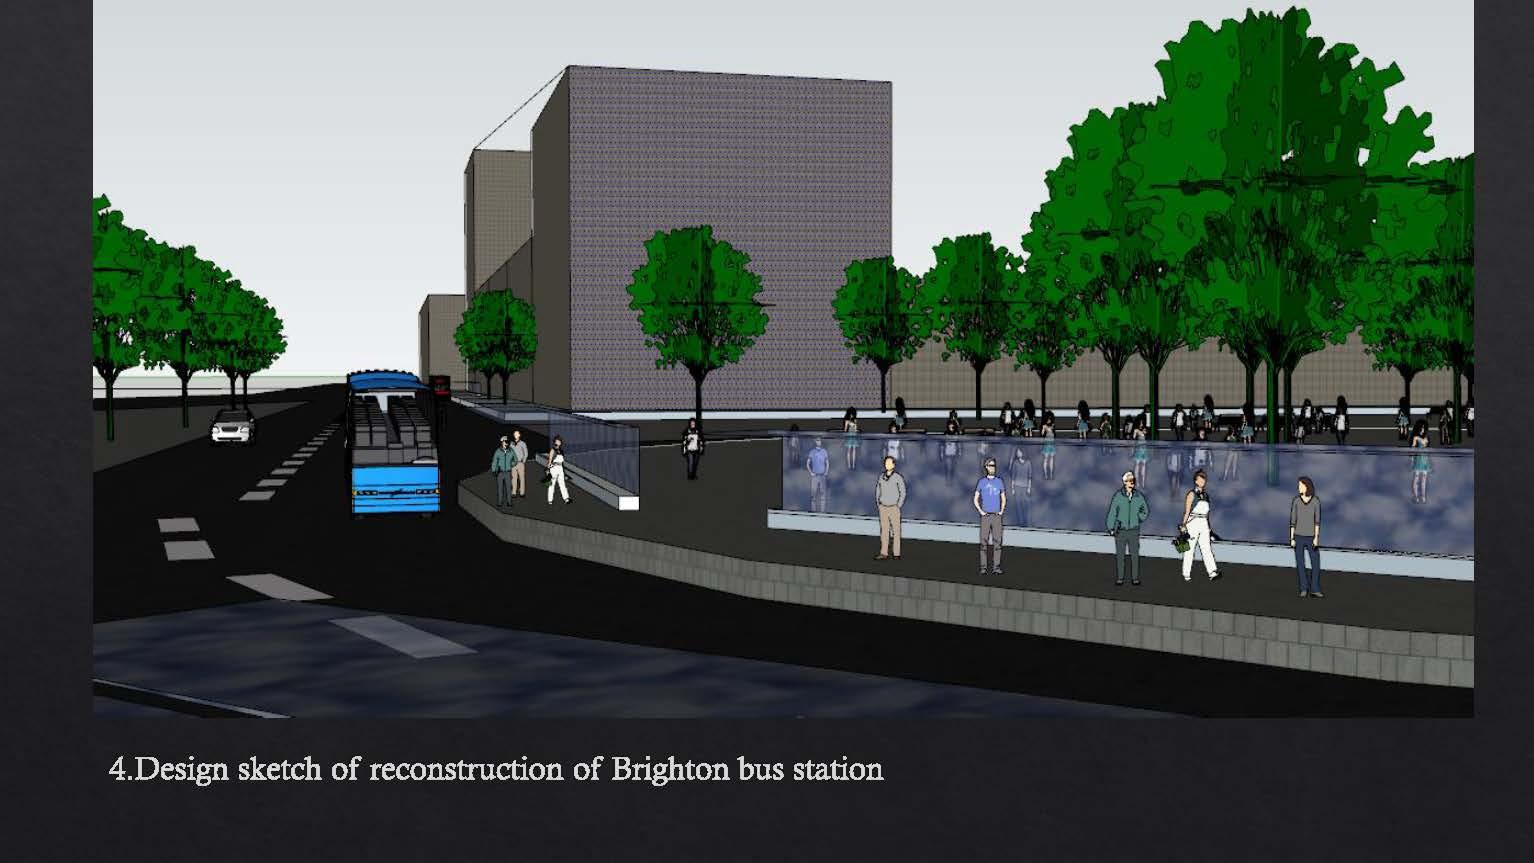 Reconstruction of Brighton bus station